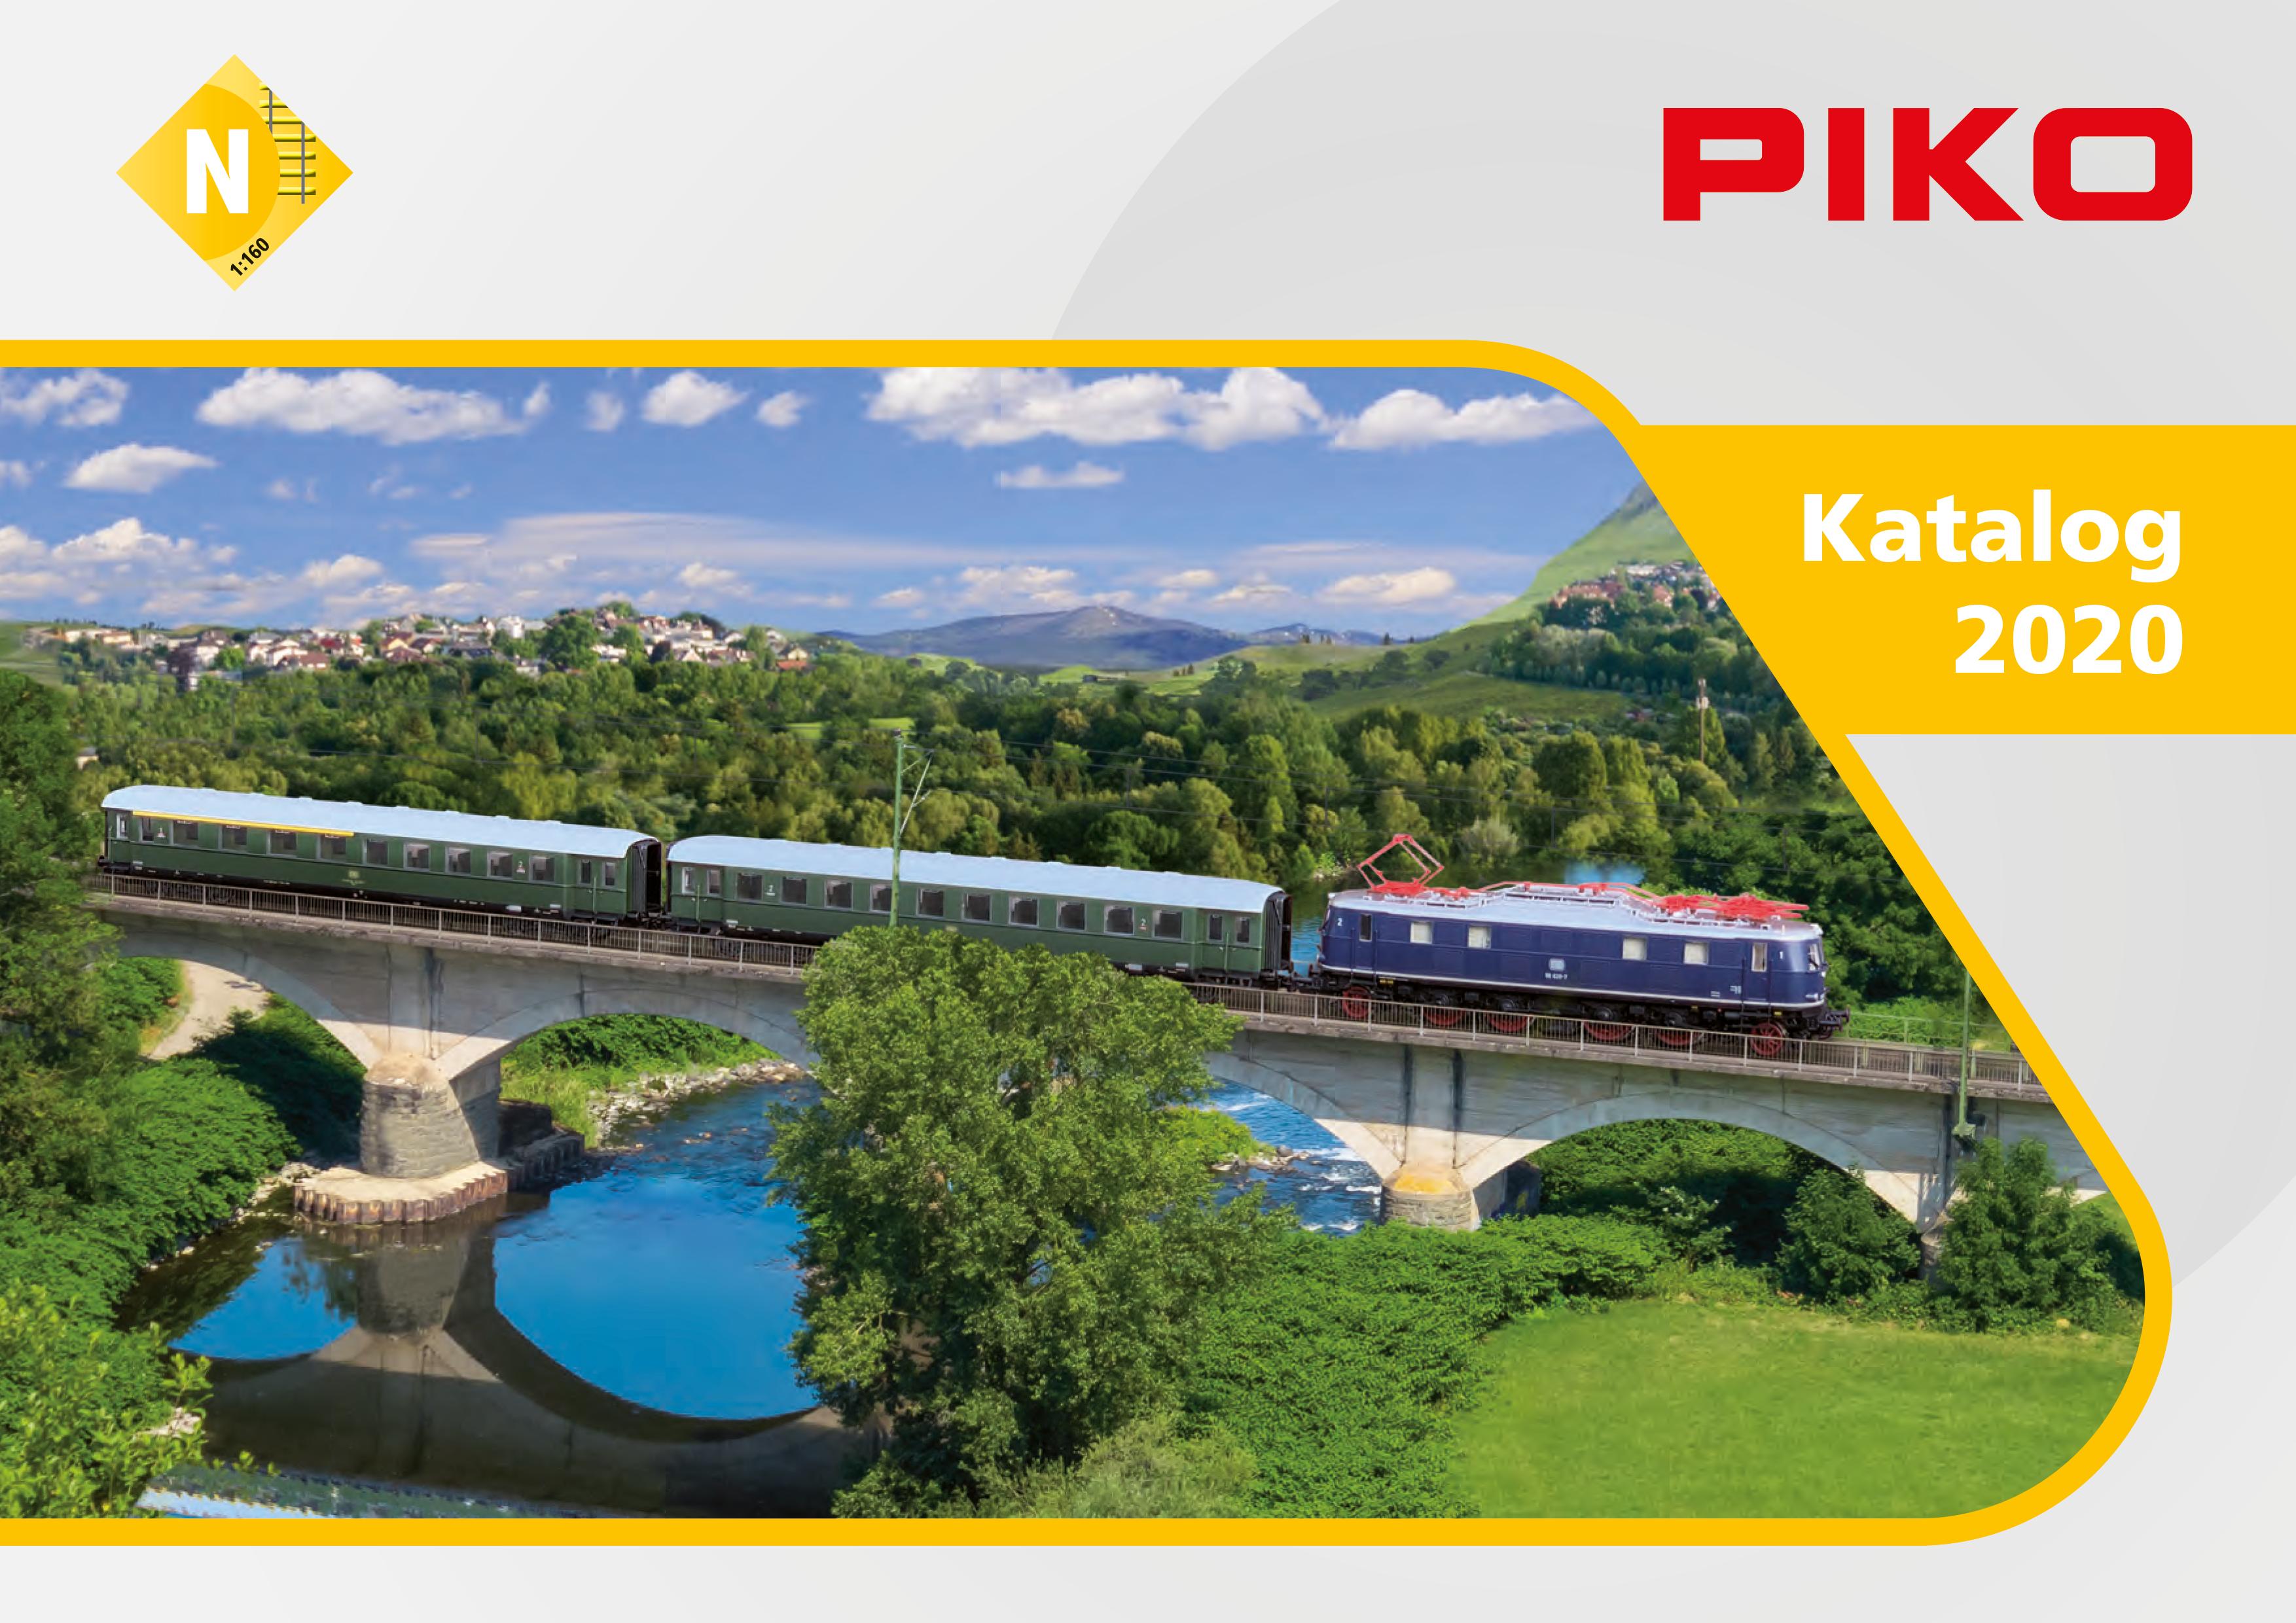 Piko-Katalog-N-2020-1